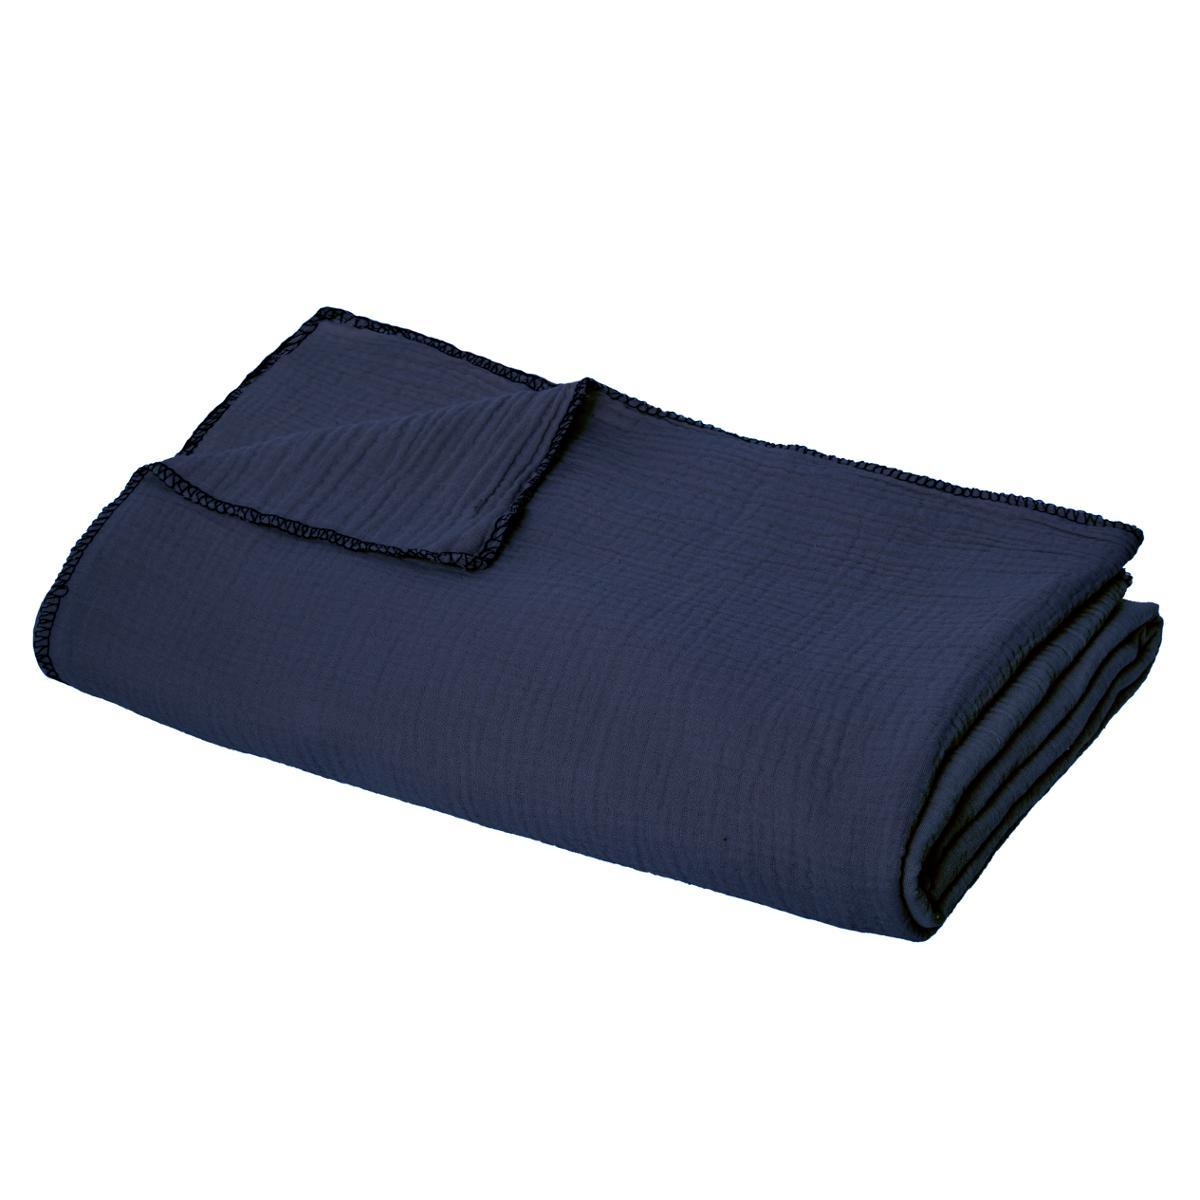 Couvre lit en Coton Crink - Atmosphera